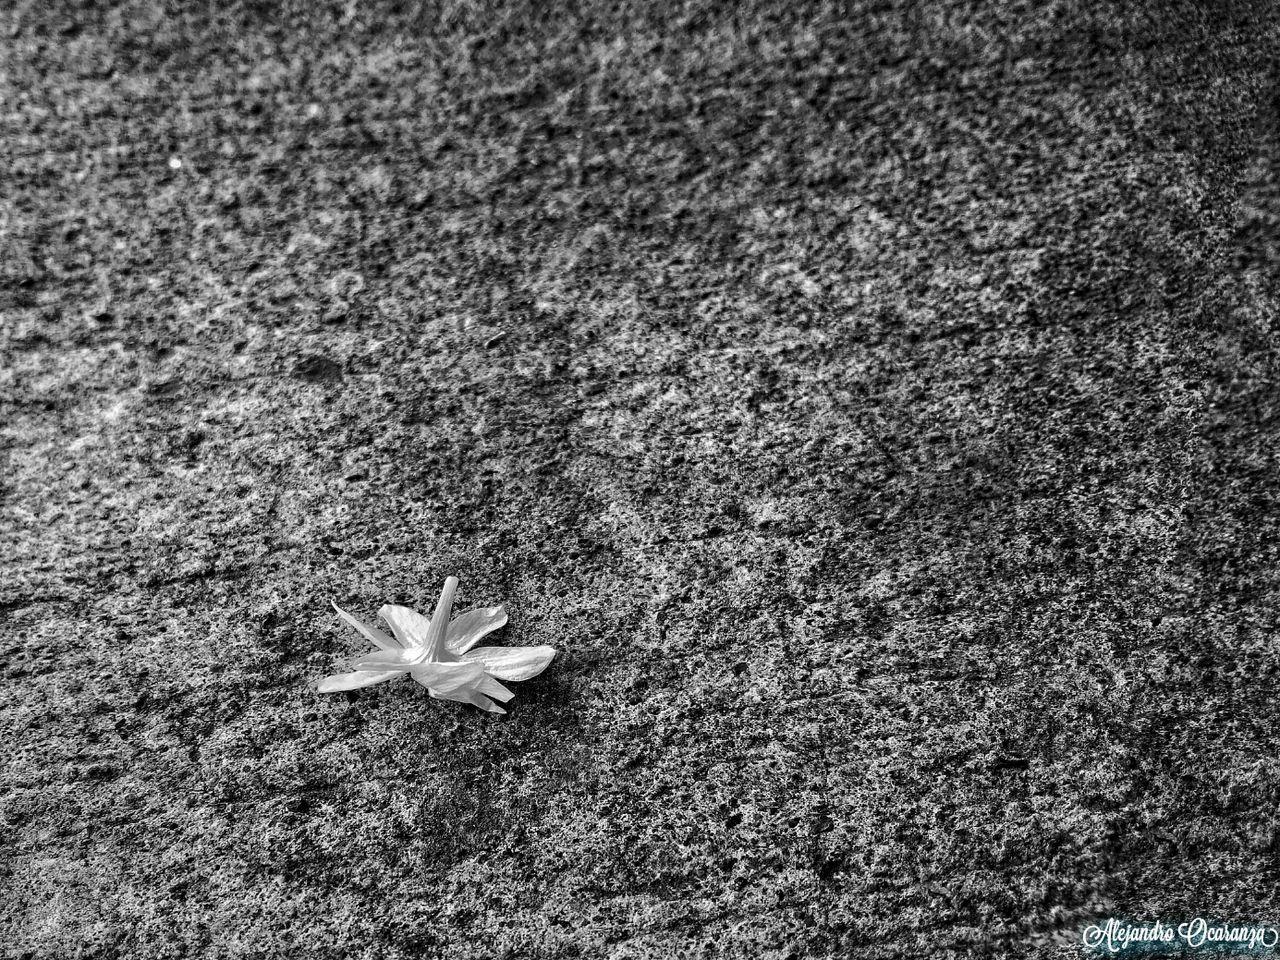 Belleza Solitaria Photographie  No People First Eyeem Photo Plant Black And White Photography Blake_and_white Street Flowers Flower City Nature Photo Guadalajara Mexico Photography Guadalajara Jalisco Photos Day Photographer Blsckandwhite B&w Blackandwhitephotography Black & White Close-up Illuminated